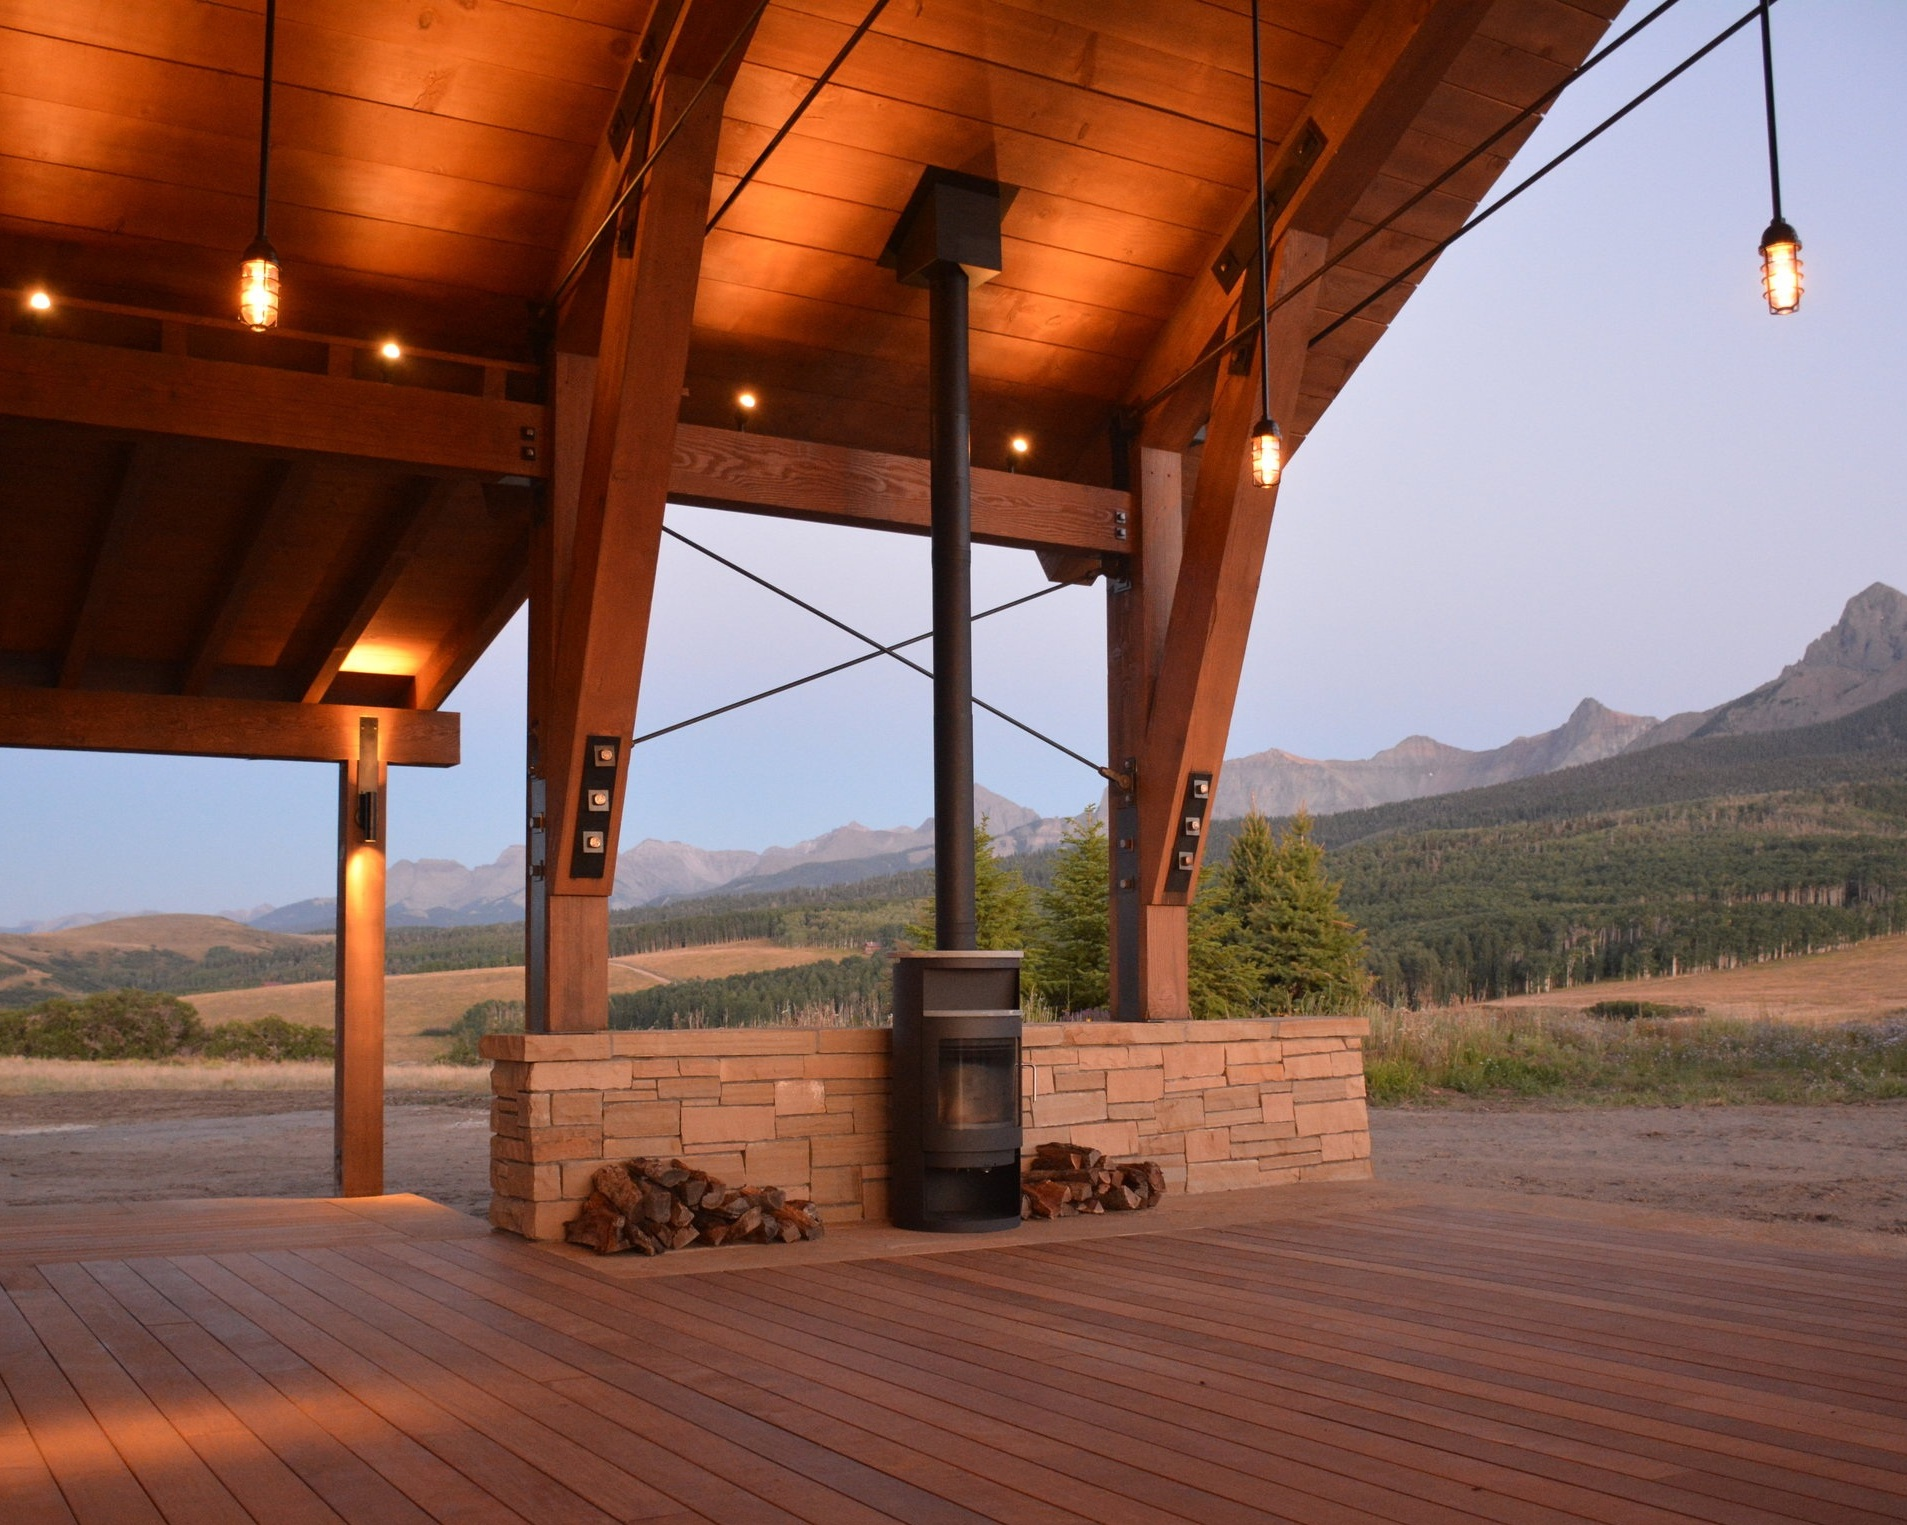 Residential - home design / Community design & rehabilitation